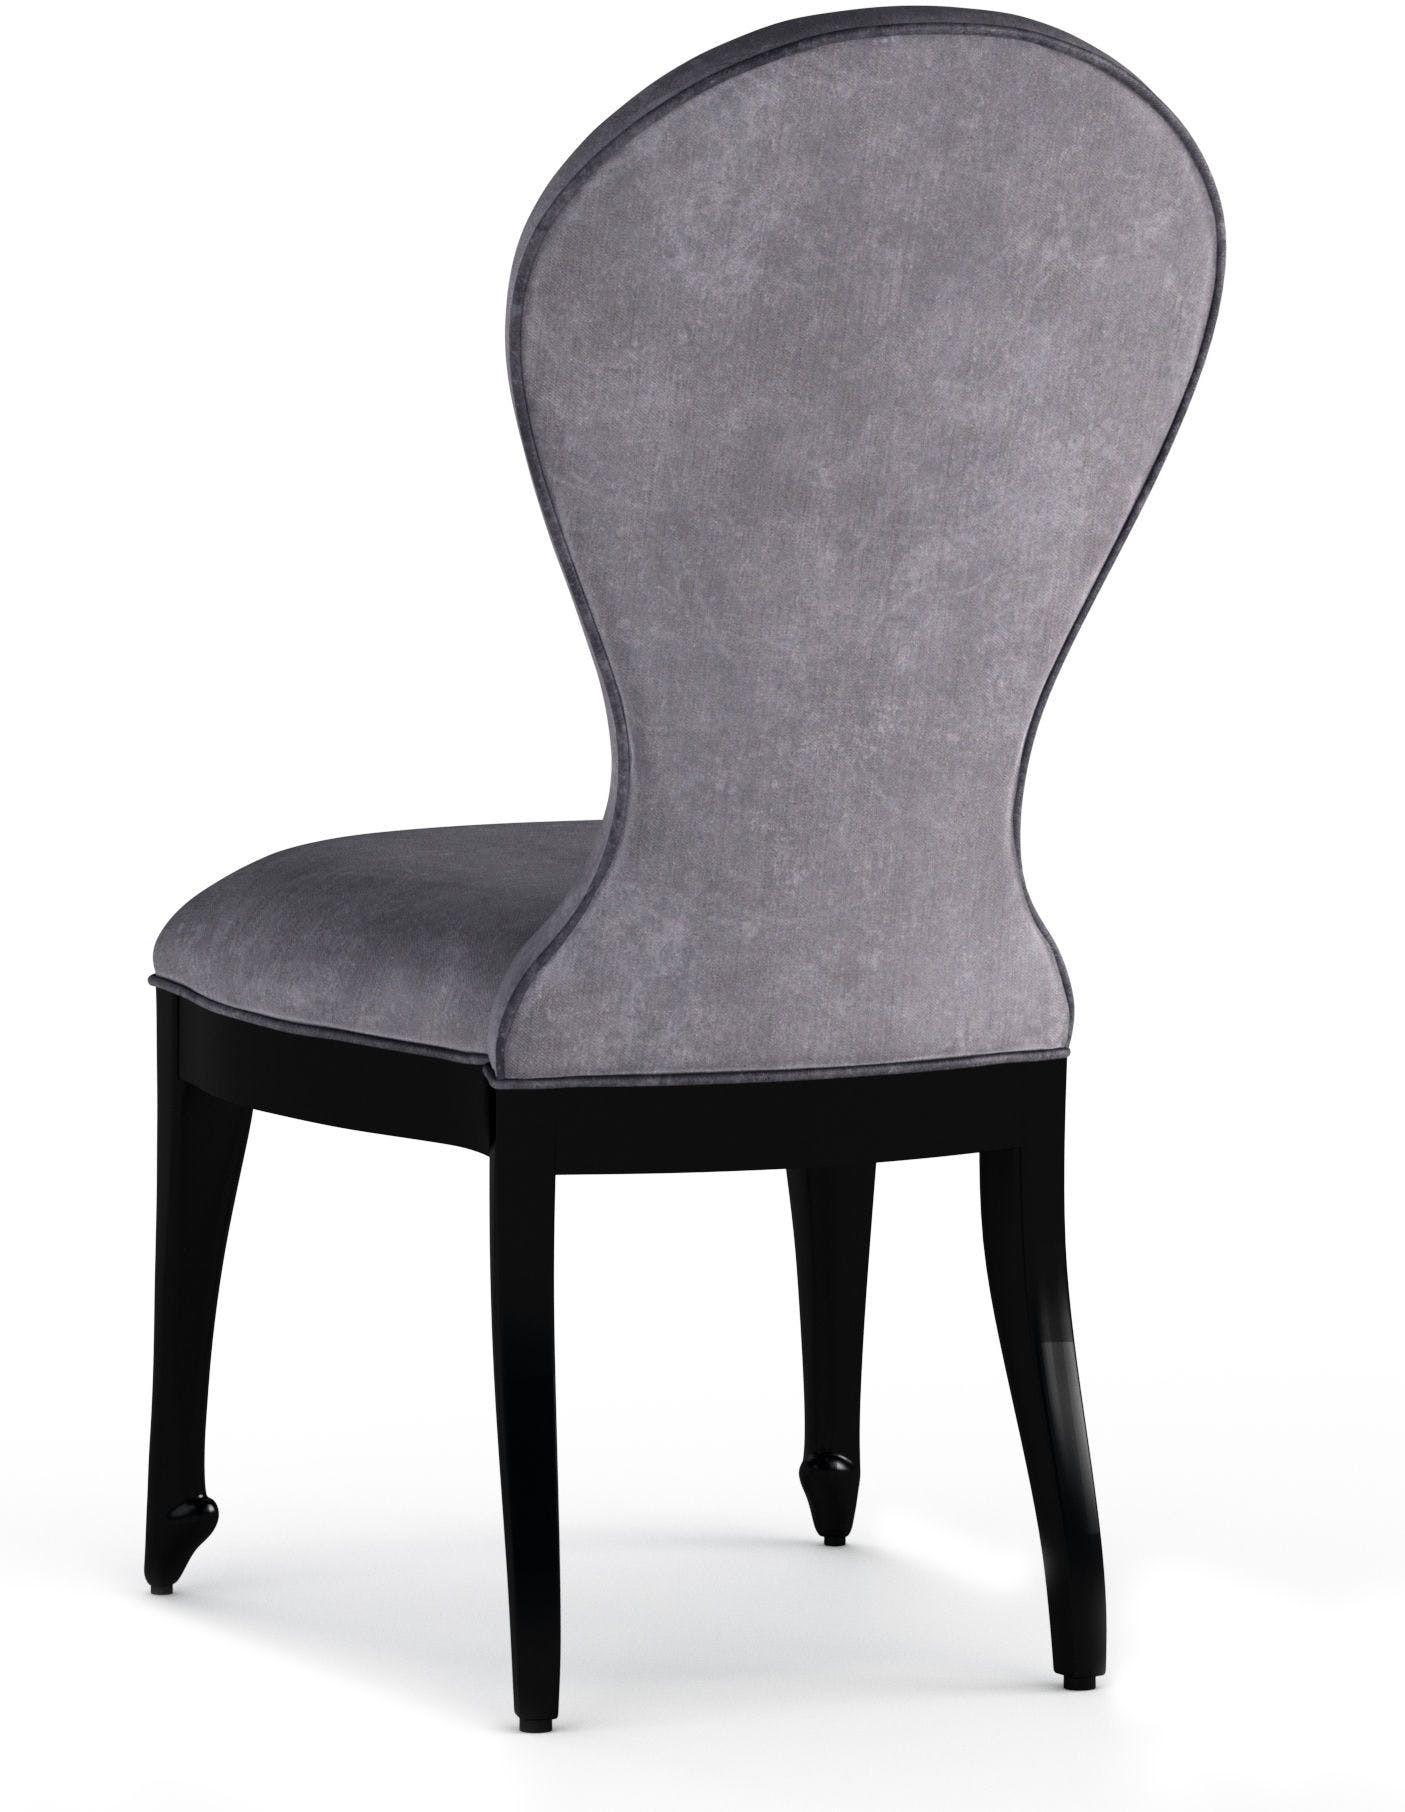 Cynthia Rowley En Pointe Dining Chair Shop Now